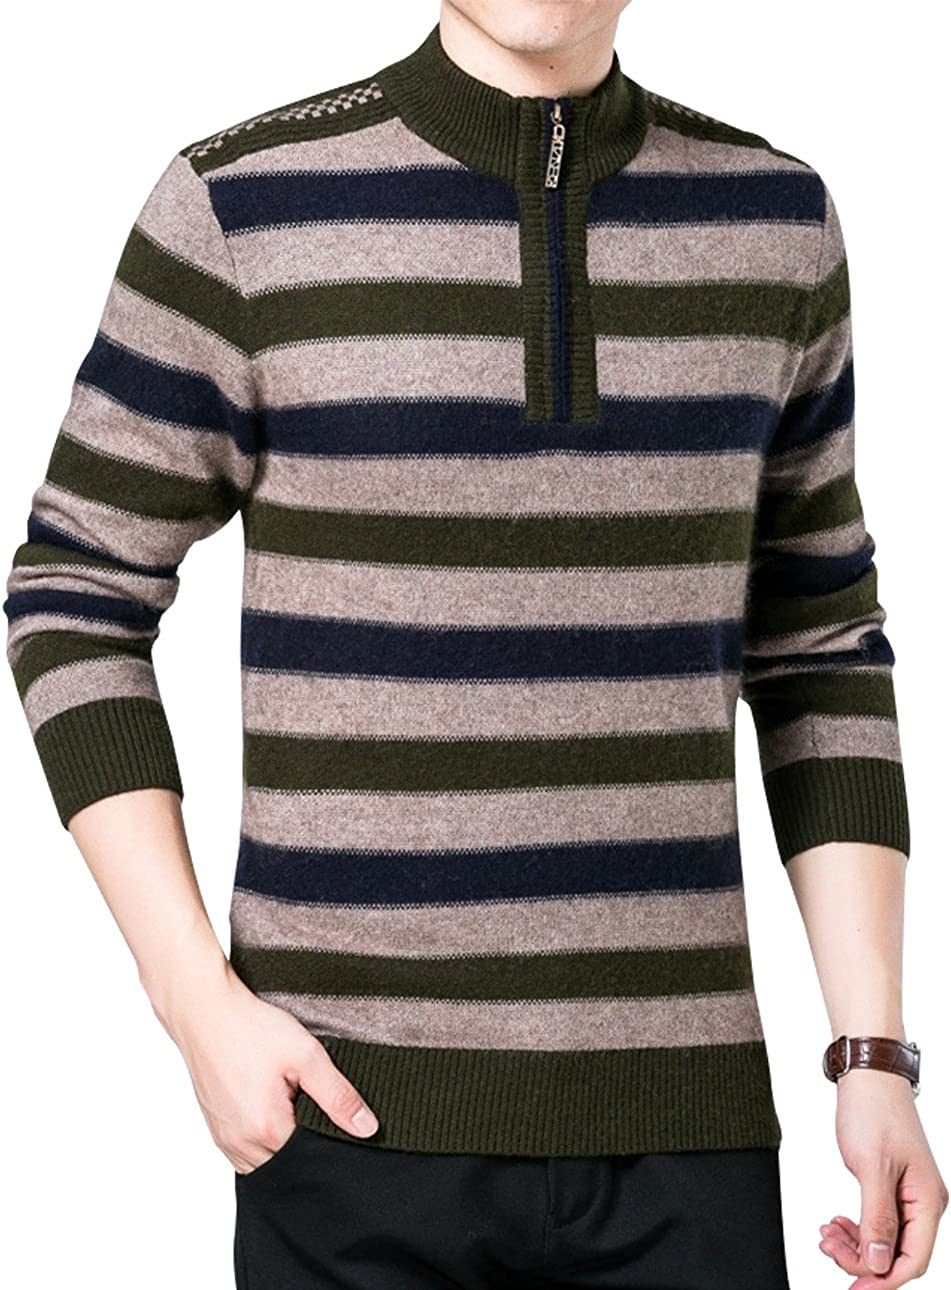 UUYUK Men Long Sleeve Crewneck Stripe Pullover Knit Slim Fit Sweater